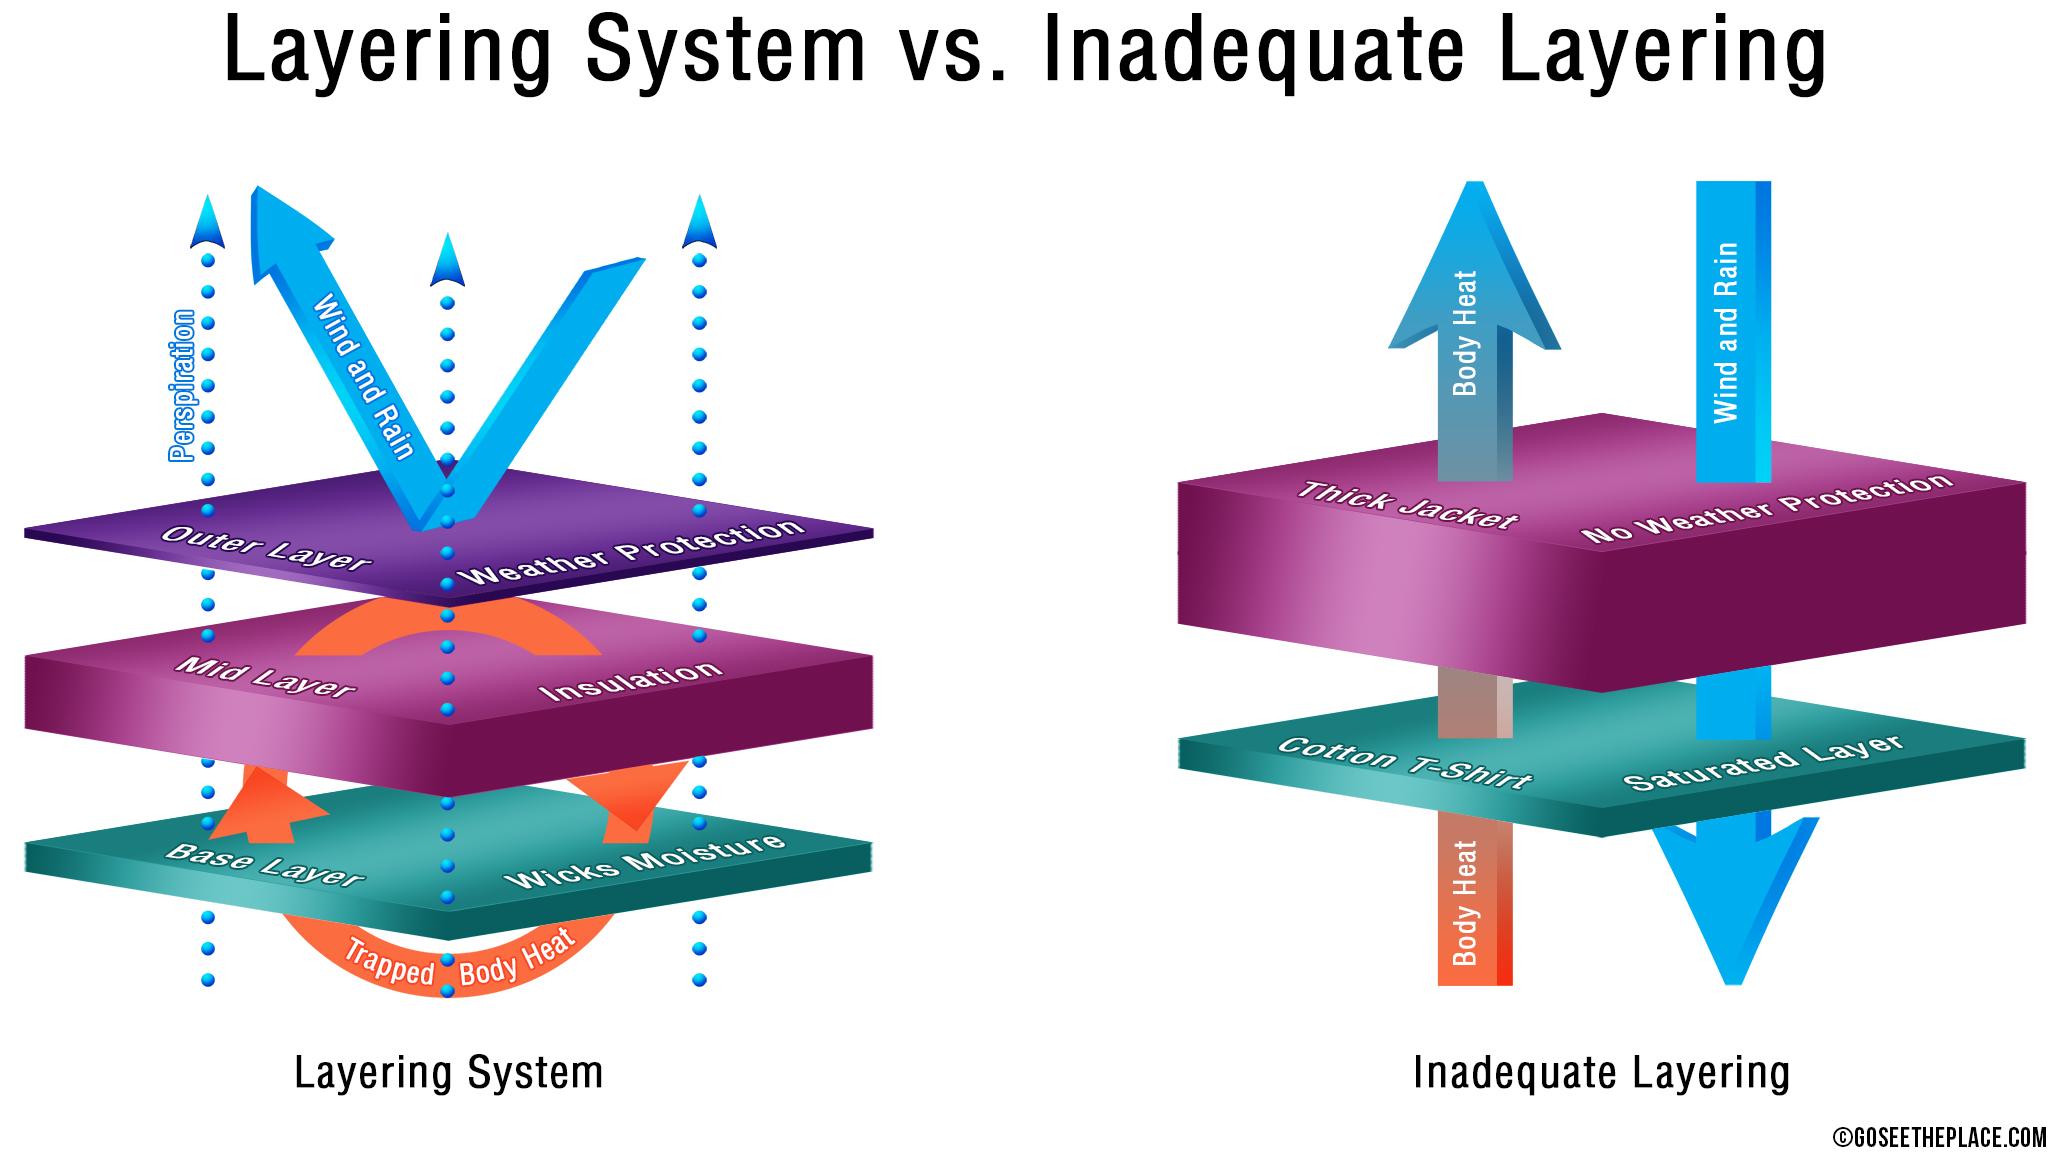 Layering System vs. Inadequate Layering